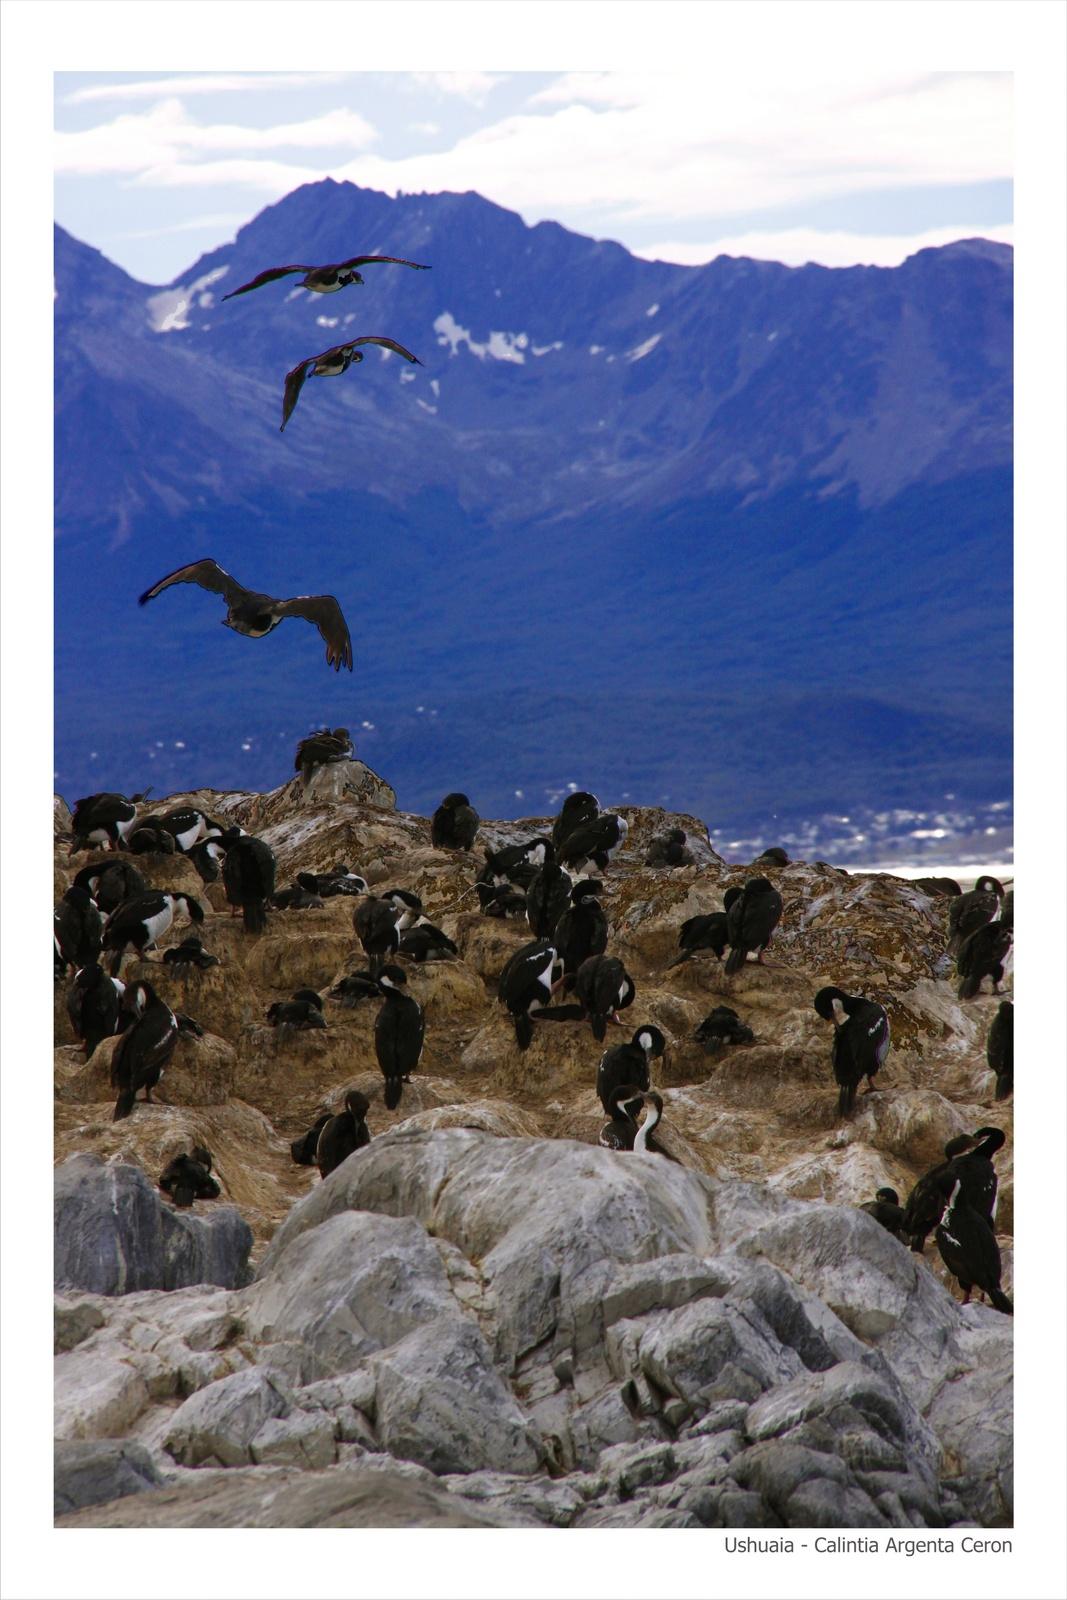 Ushuaia - Calintia Argenta Ceron - 30-45